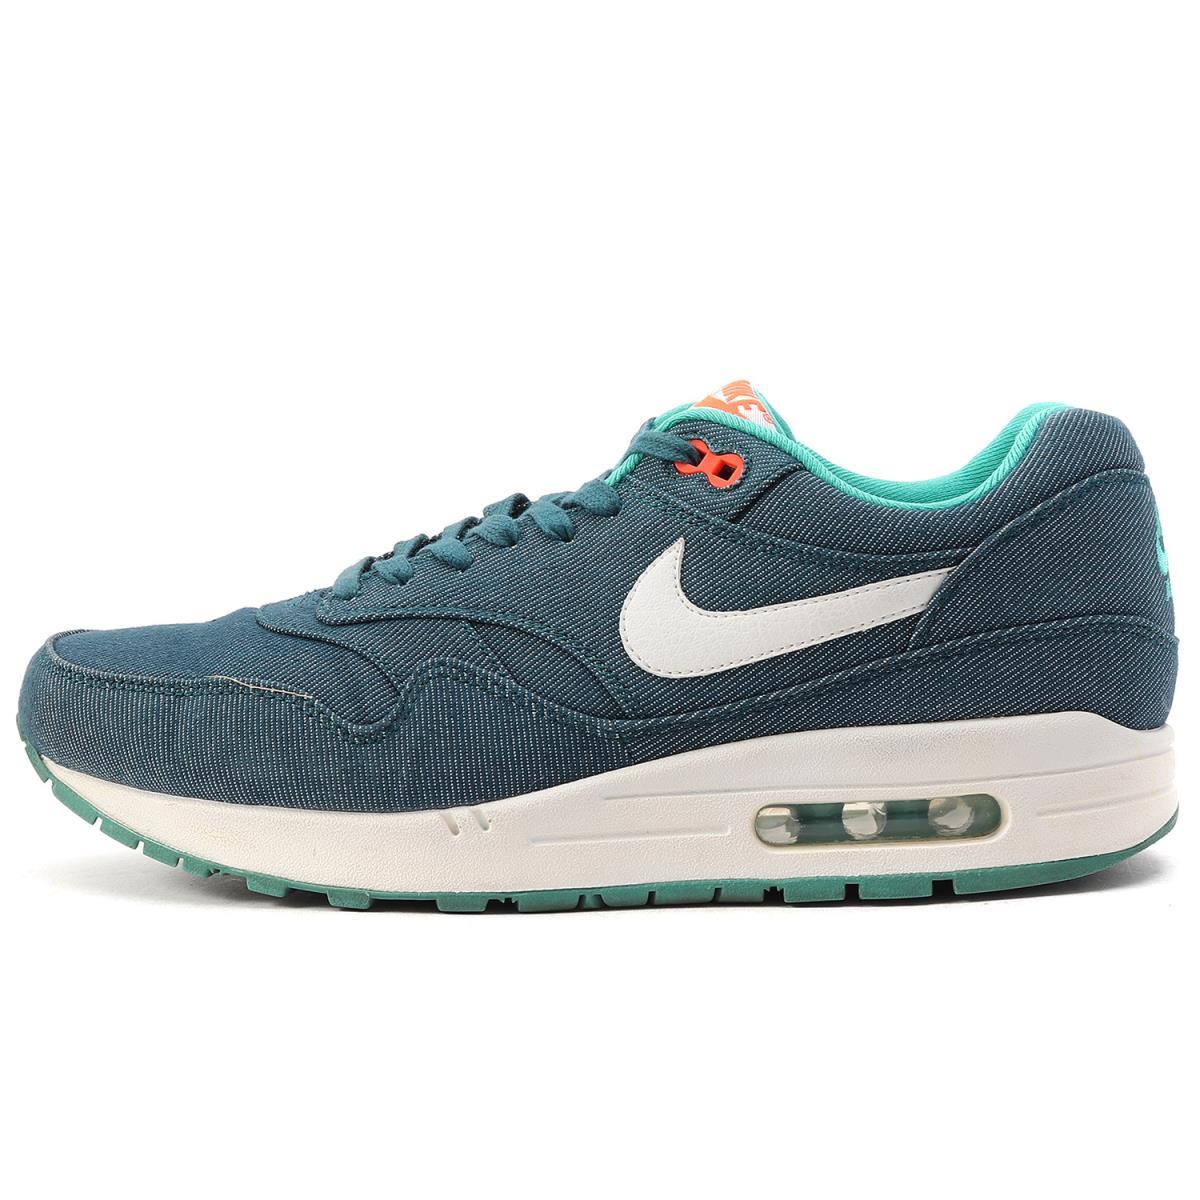 online retailer 89060 ff4e5 NIKE (Nike) AIR MAX 1 PREMIUM TURQUOISE DENIM (512,033-313) Air Max 1  midnight turquoise US9(27cm)